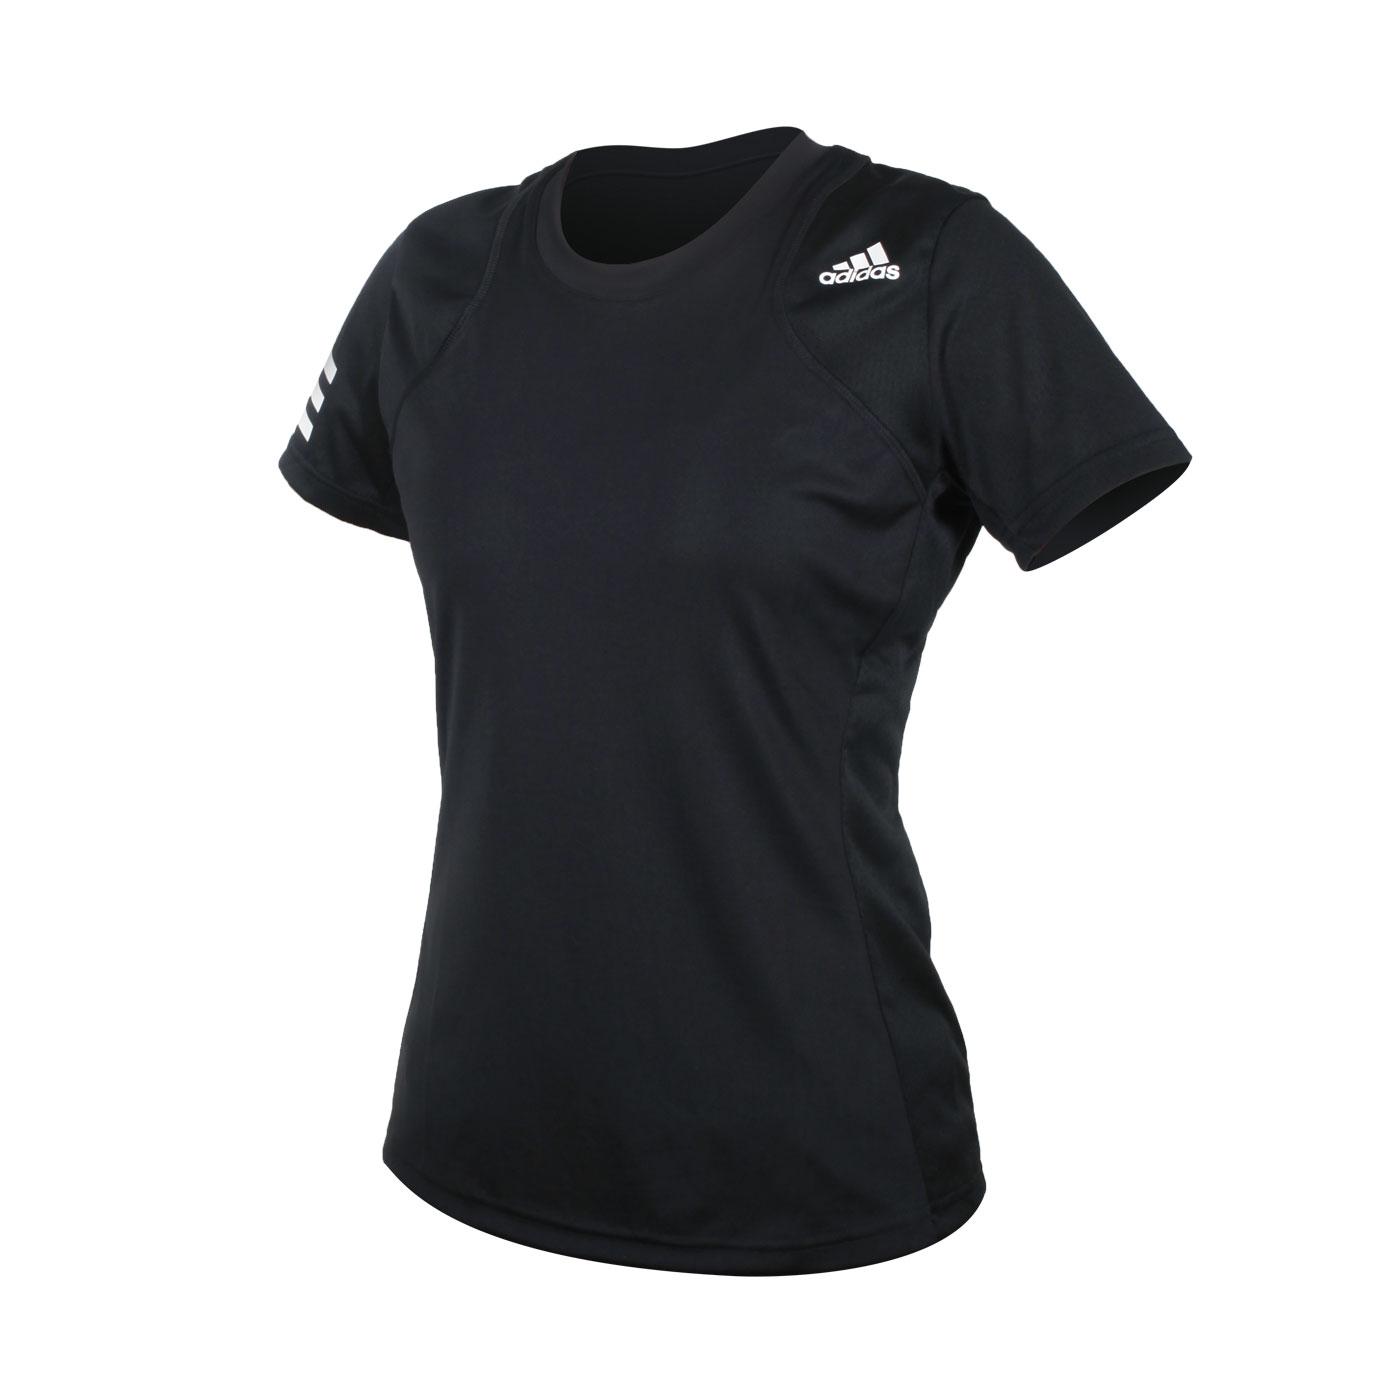 ADIDAS 女款短袖T恤 GL5530